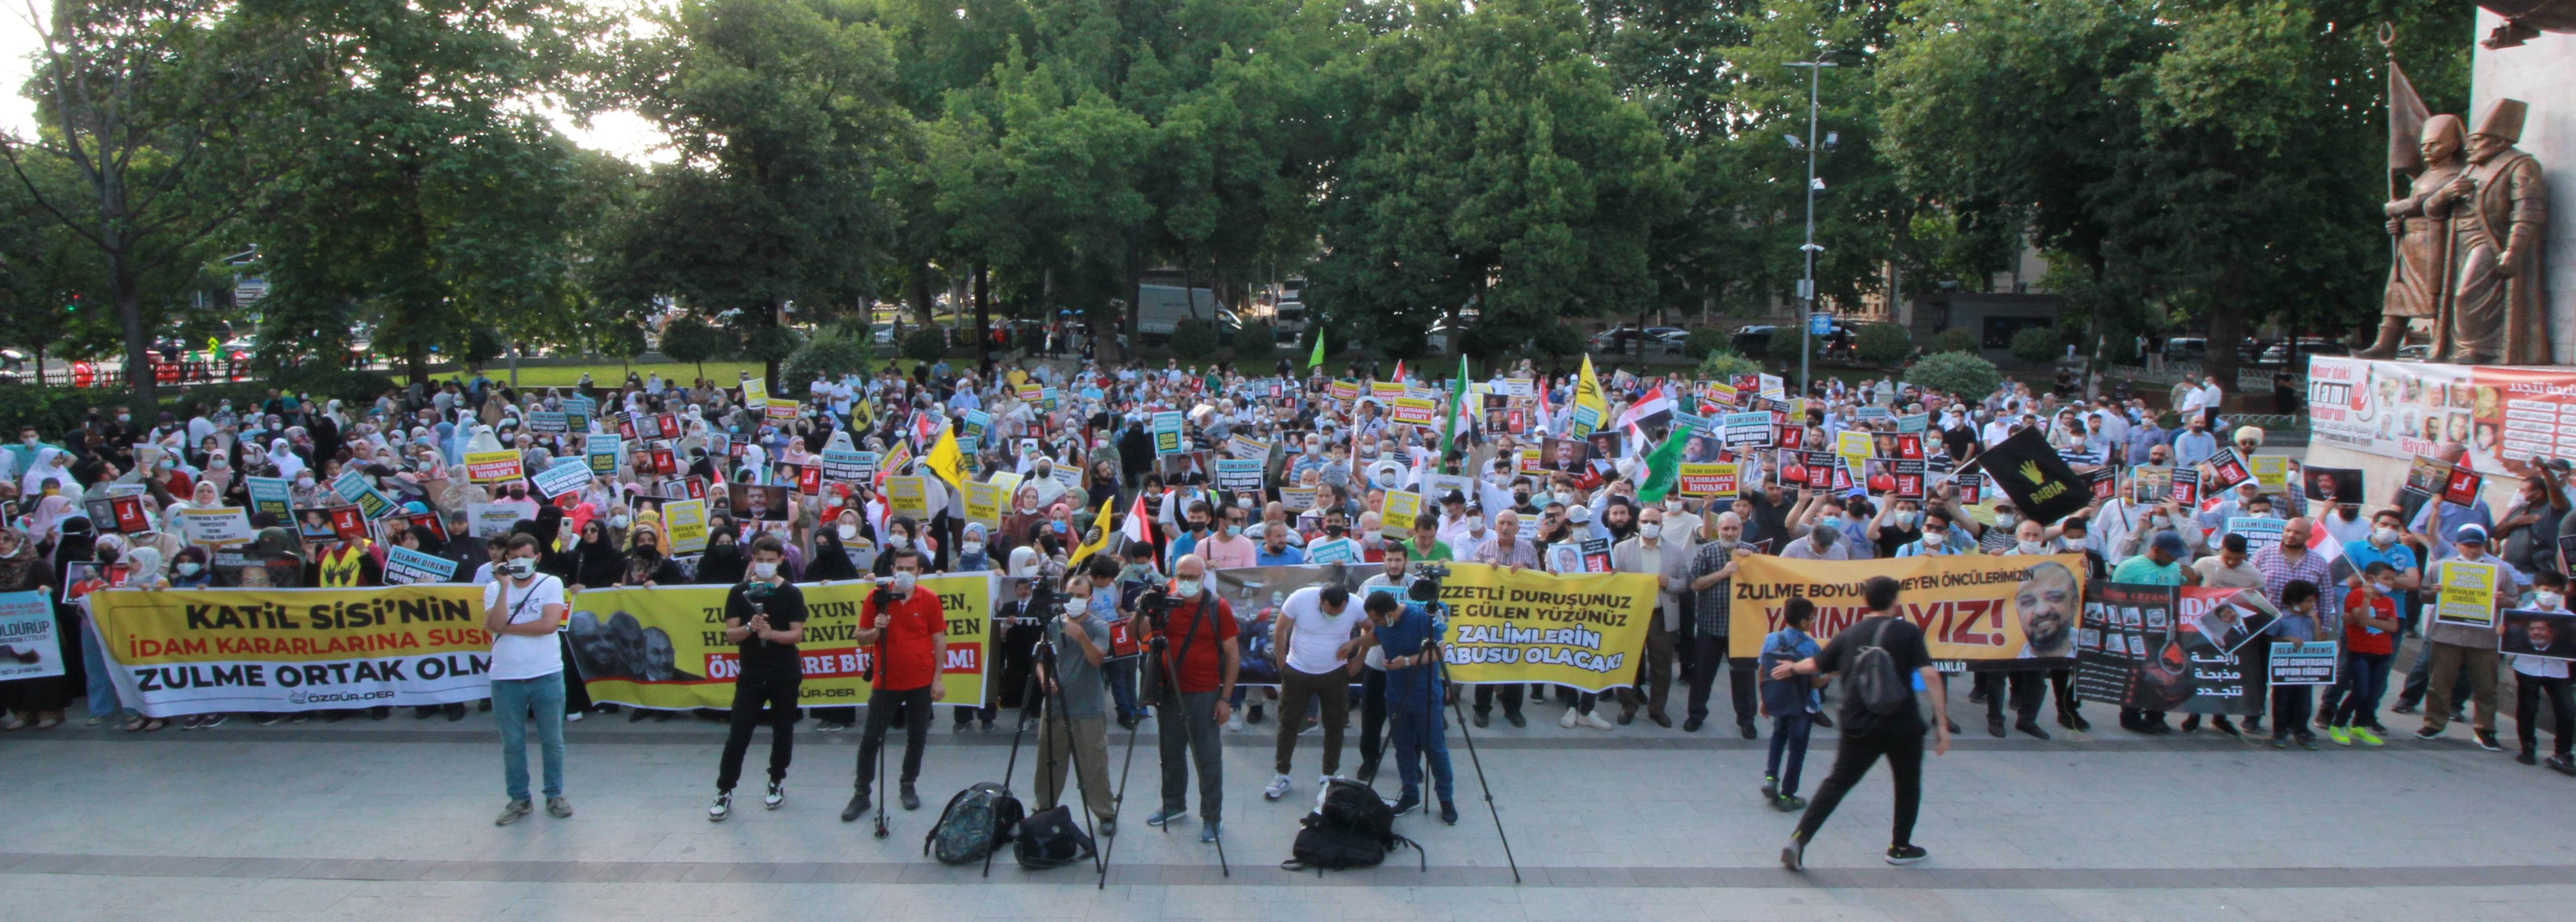 misir-idam-protesto-sarachane-3temmuz2021-9.jpg